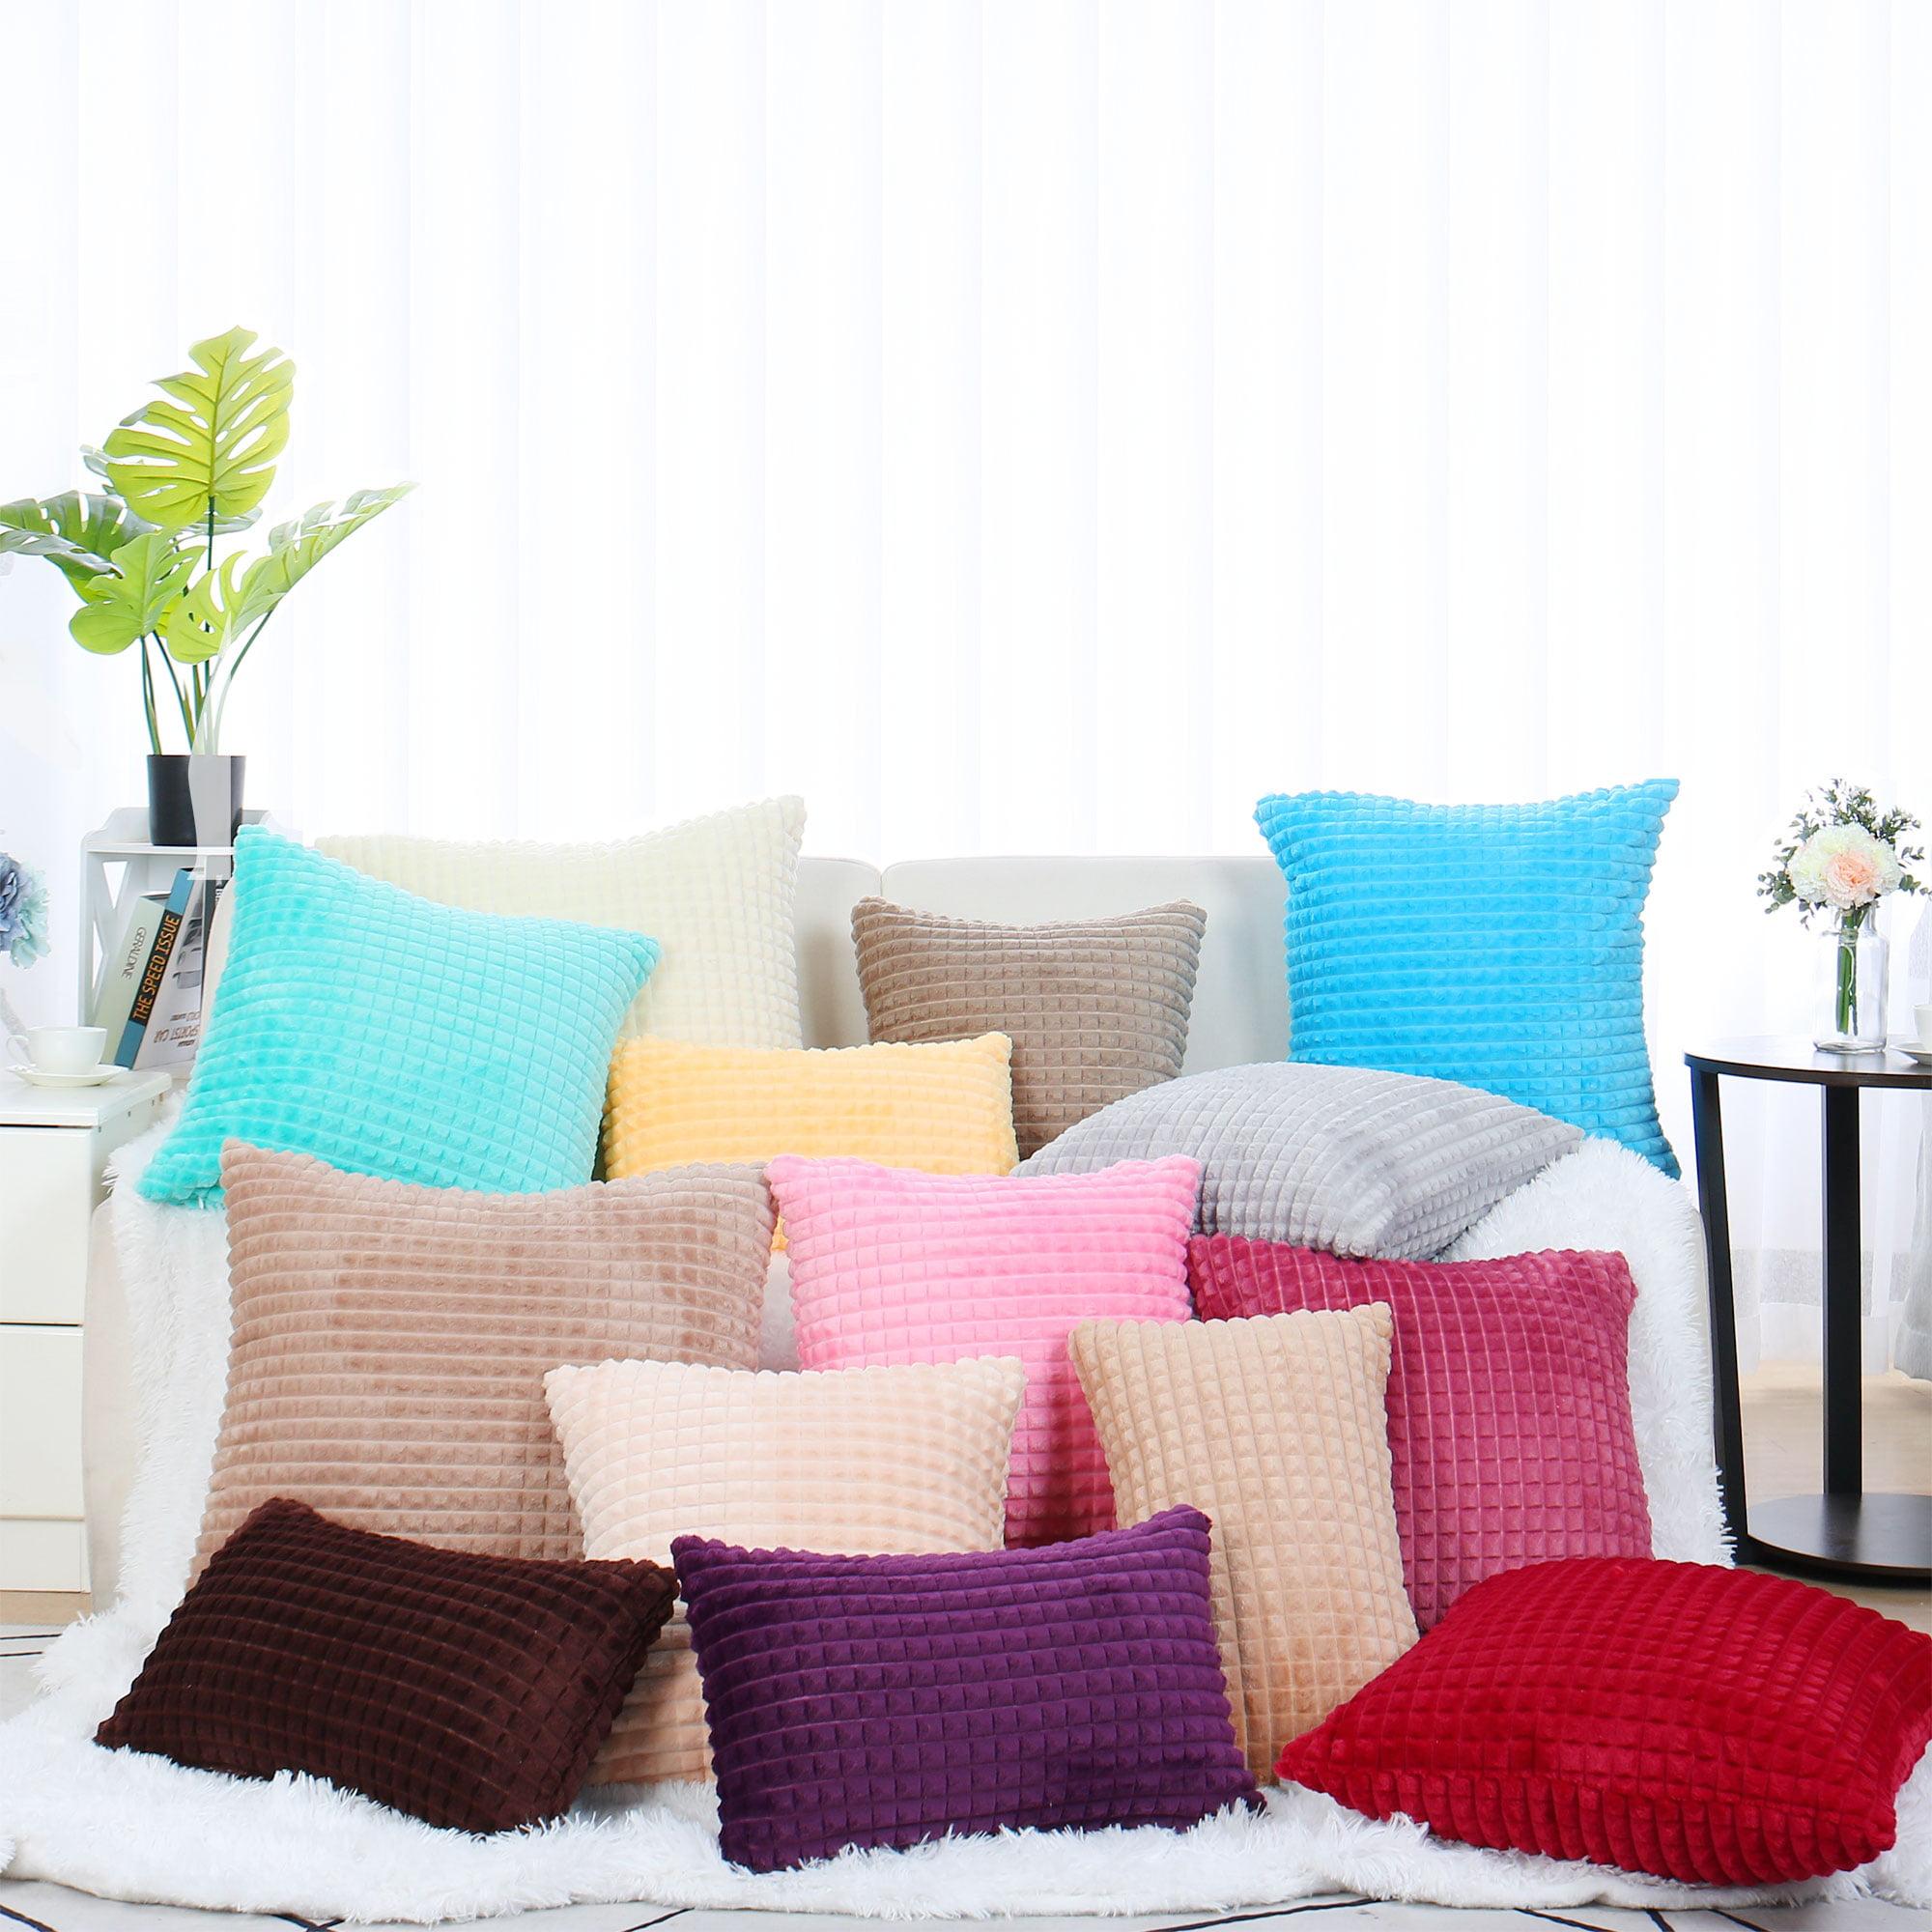 Plush Throw Pillow Case Faux Fur Cushion Cover Deluxe Home Decorative for Sofa Couch Bed Car (12 x 20 Inch 30 x 50cm, Li - image 8 de 8